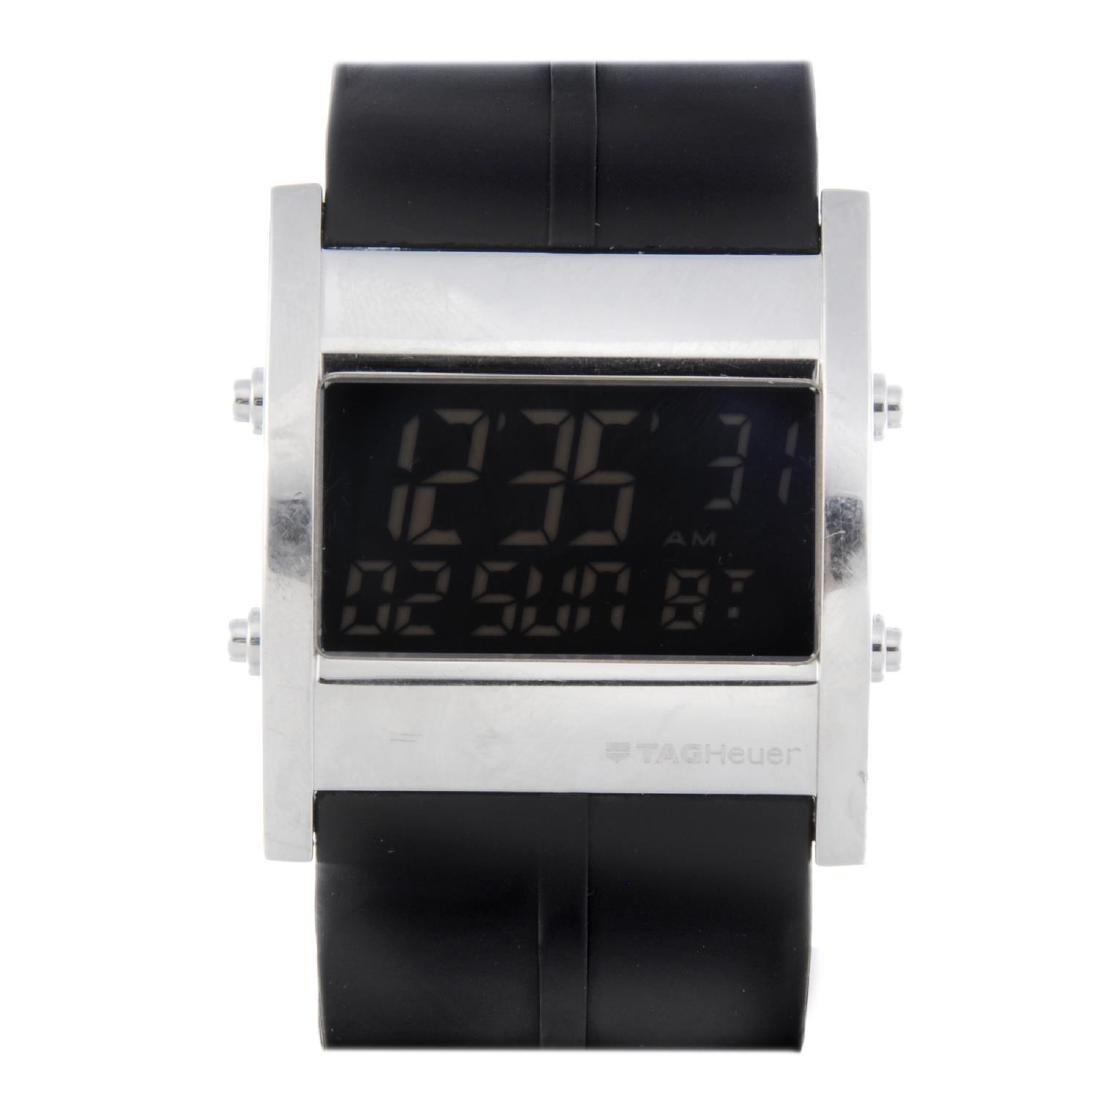 TAG HEUER - a gentleman's MicroTimer wrist watch.